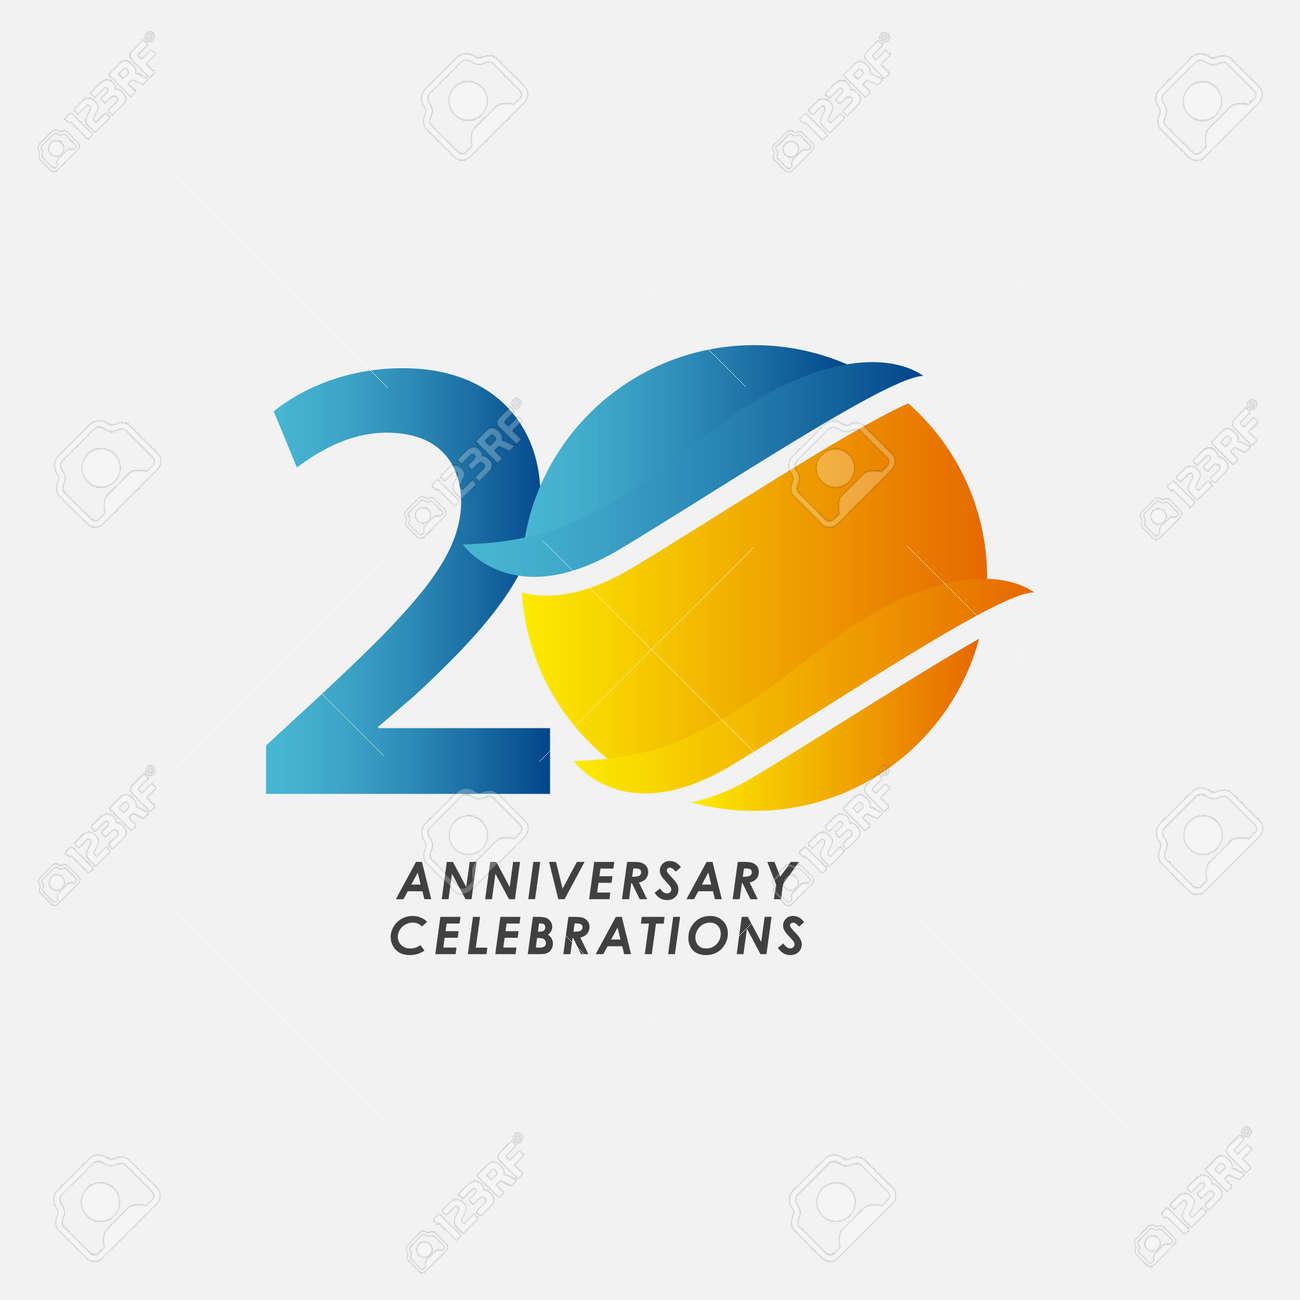 20 Years Anniversary Celebrations Vector Template Design Illustration - 163698030